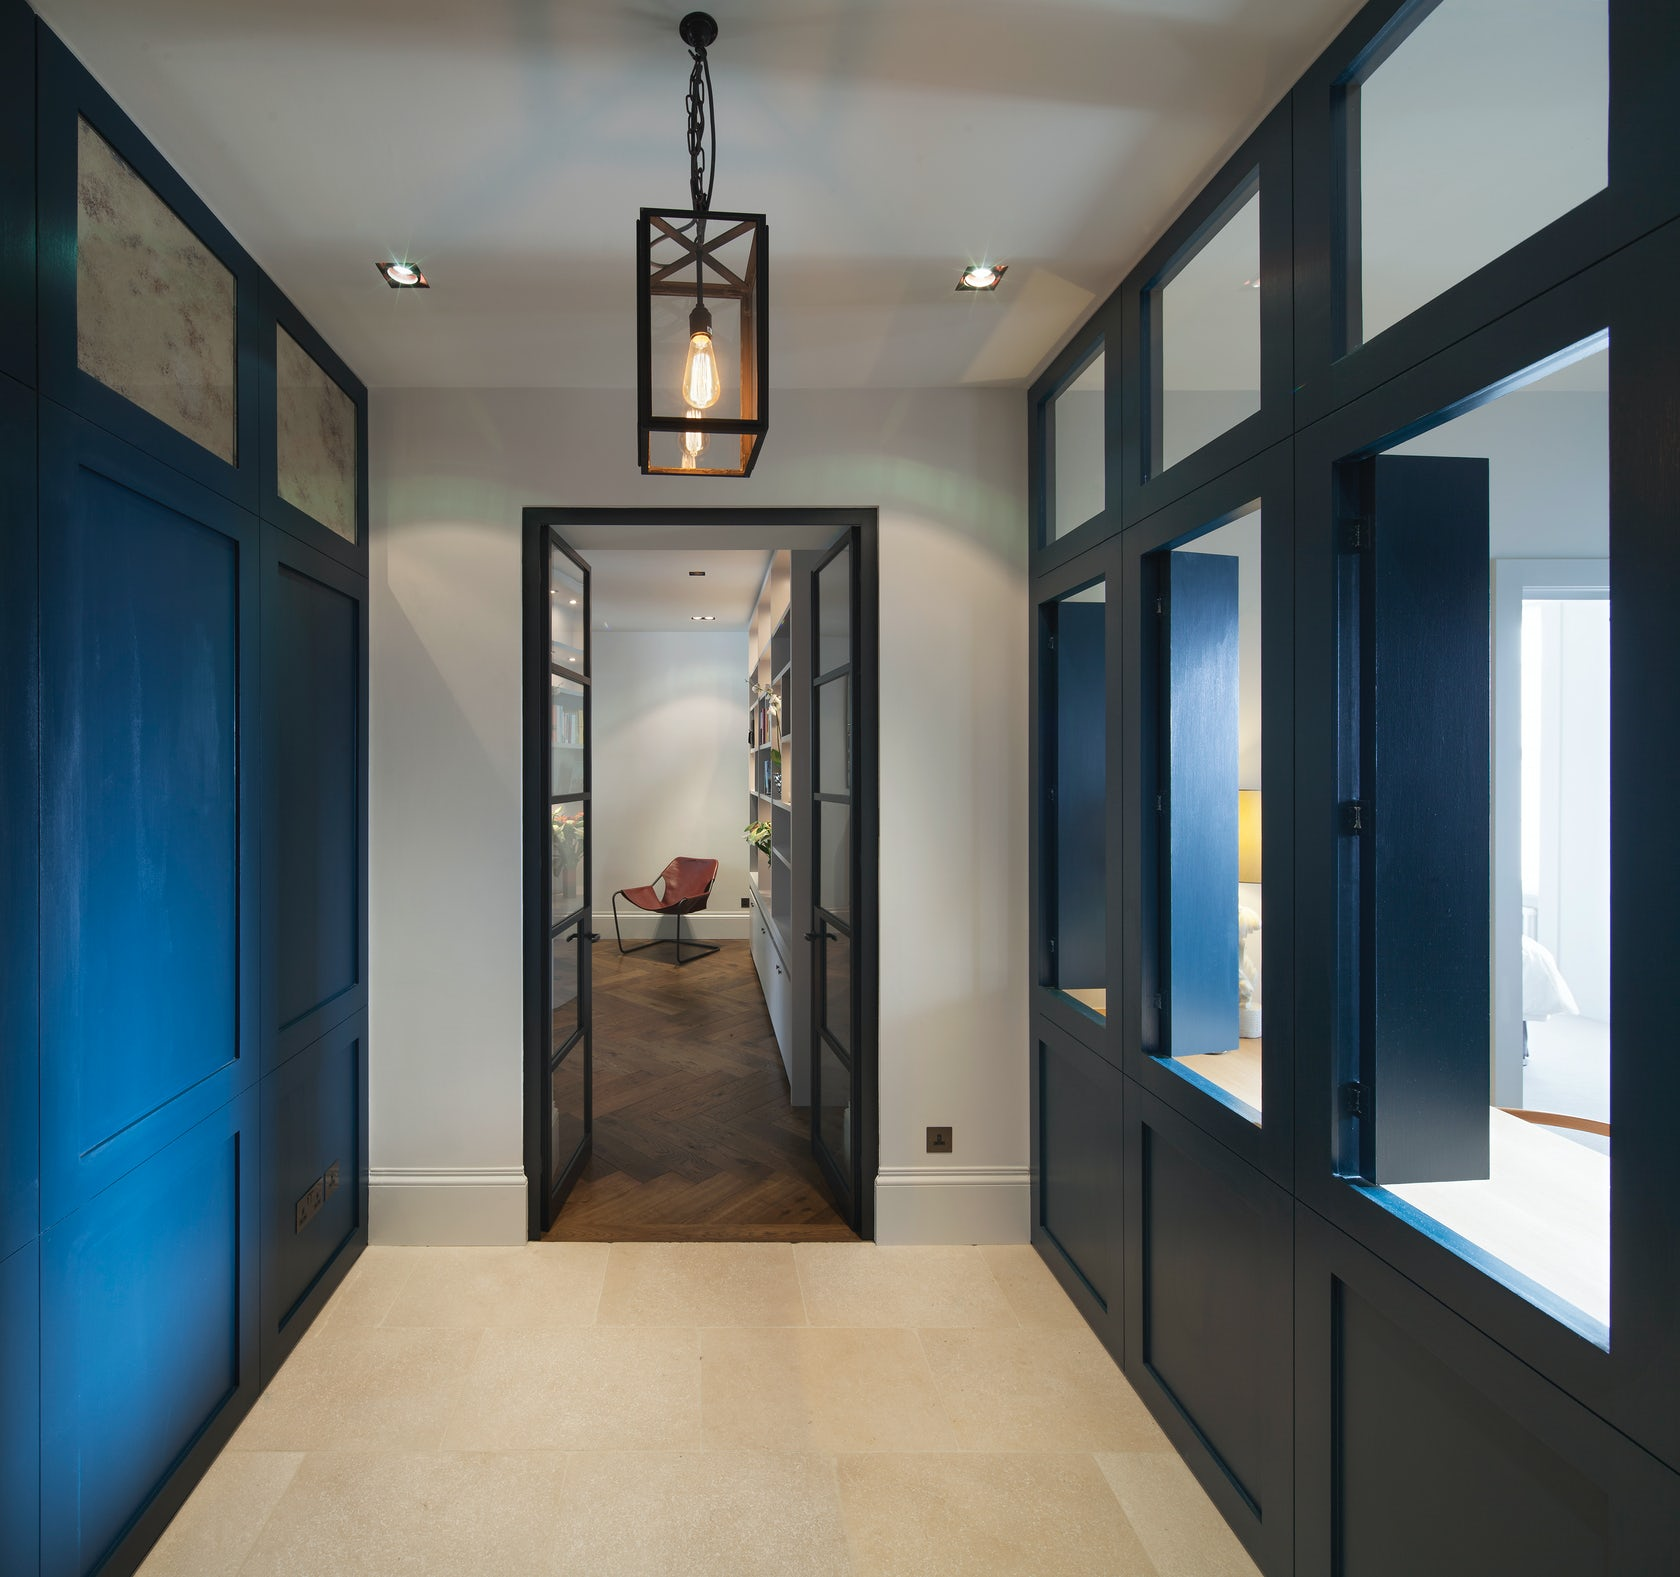 January Apartment Jobs Snapshot: Bassett Road